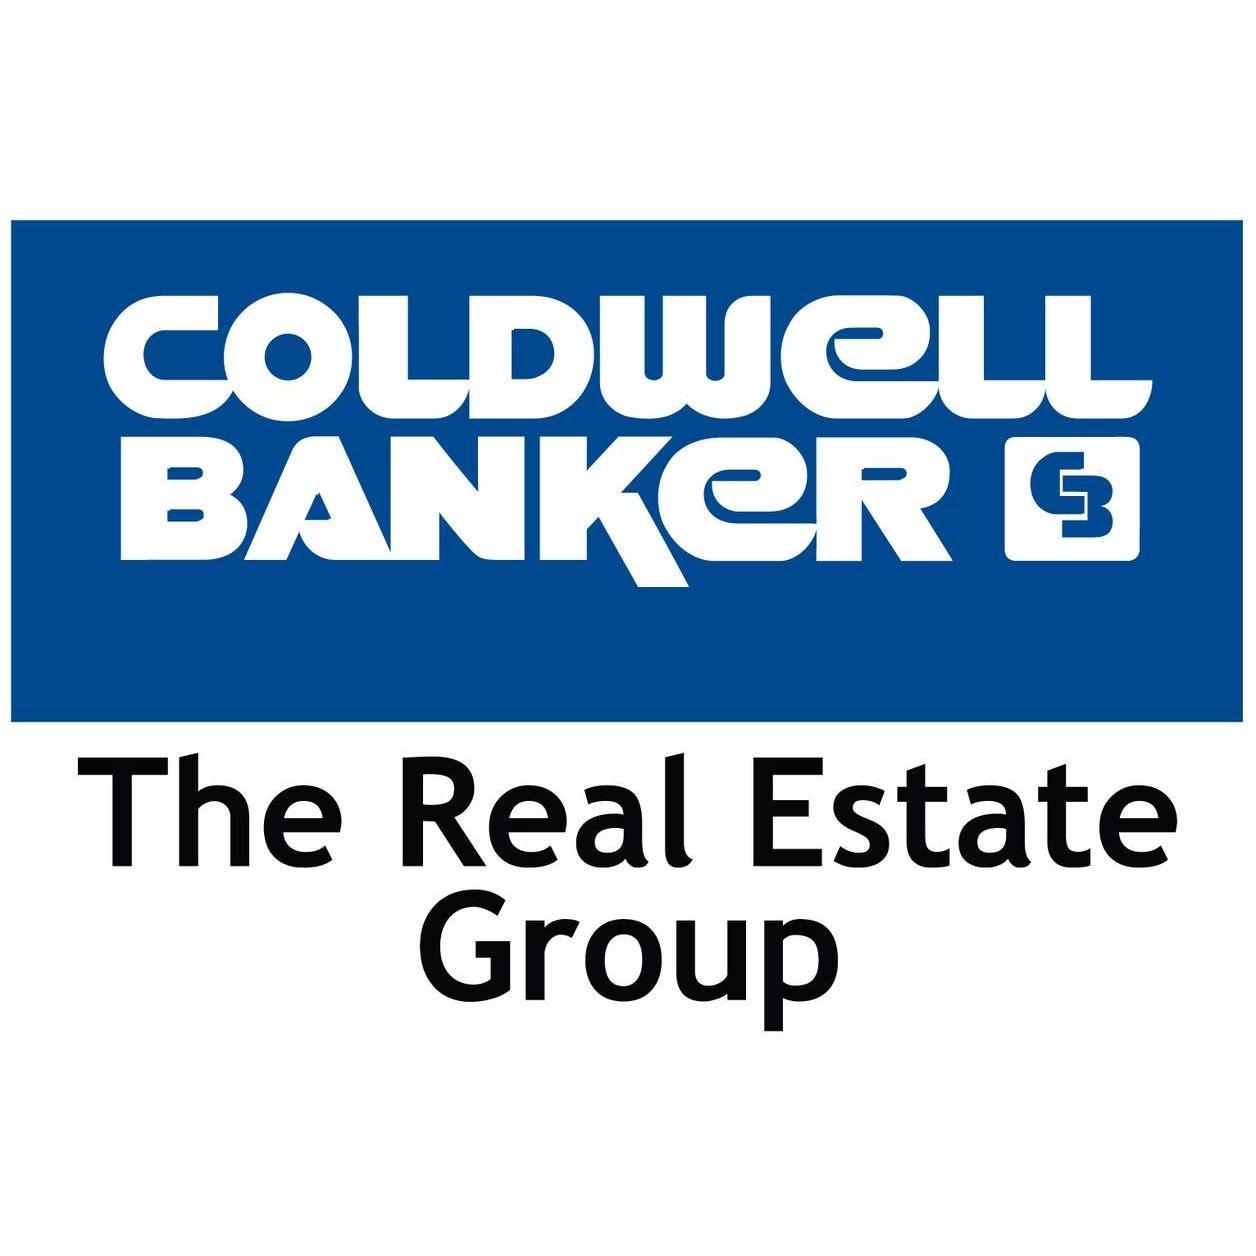 Linda Sanderfoot - Coldwell Banker The Real Estate Group image 8